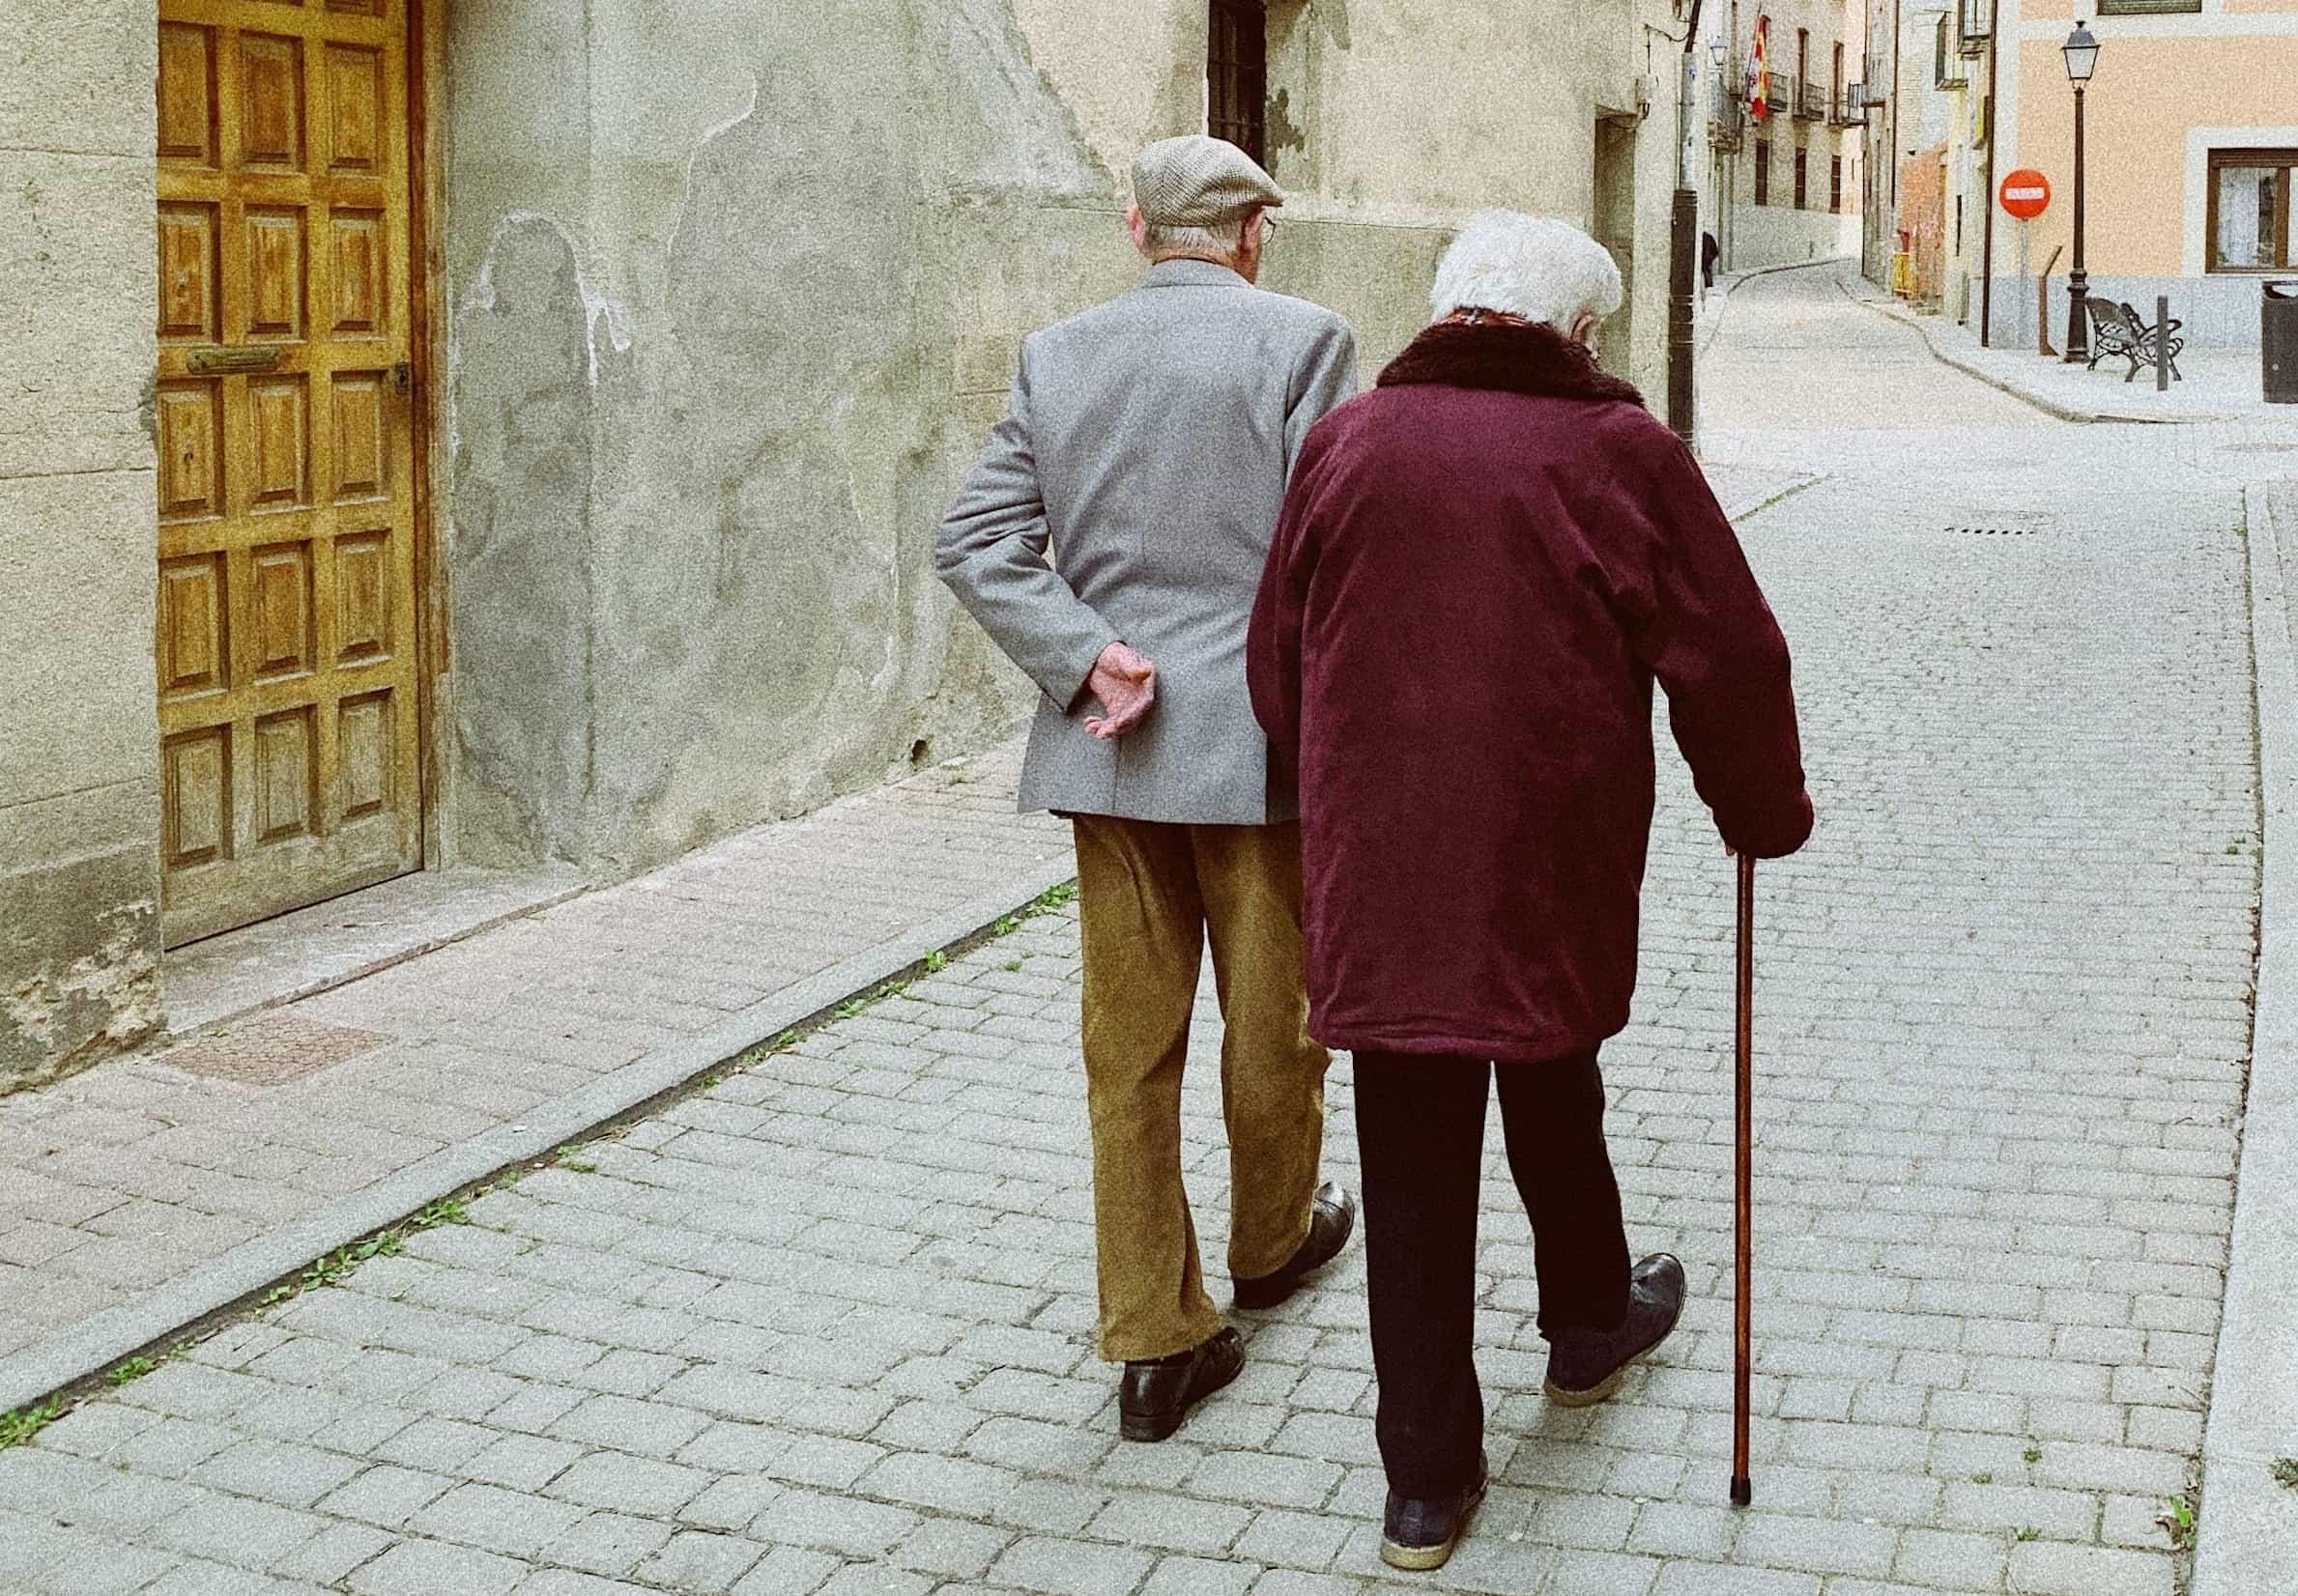 Elderly man and woman walking down cobblestone street